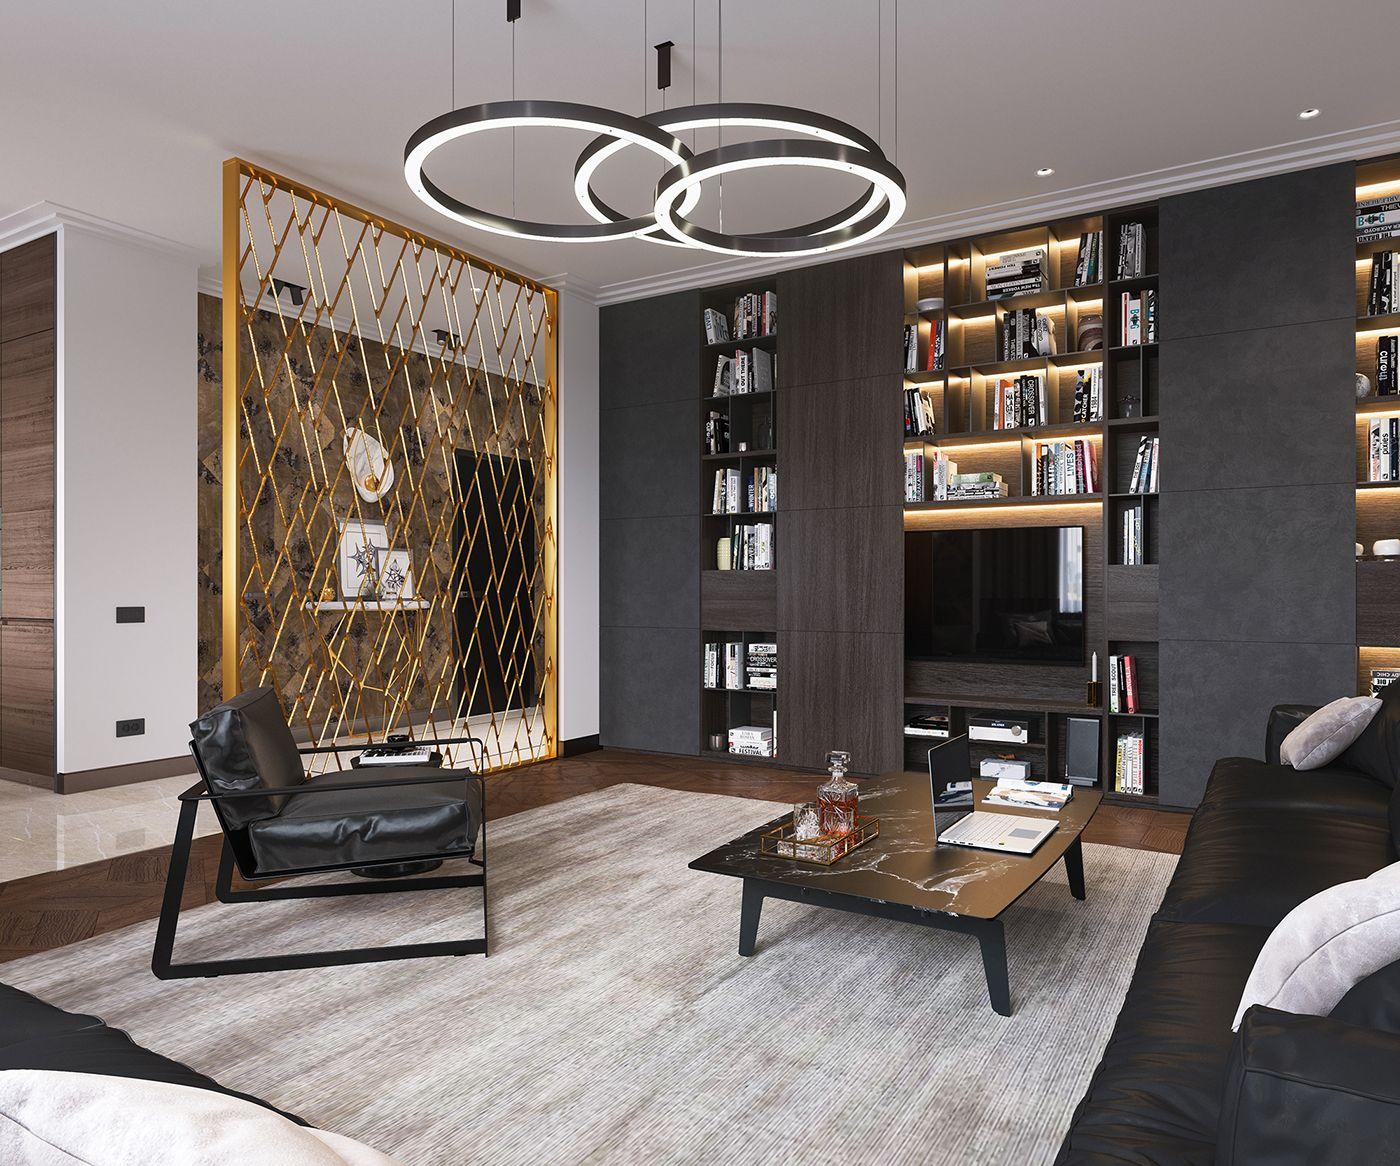 Bachelor apartment on Behance